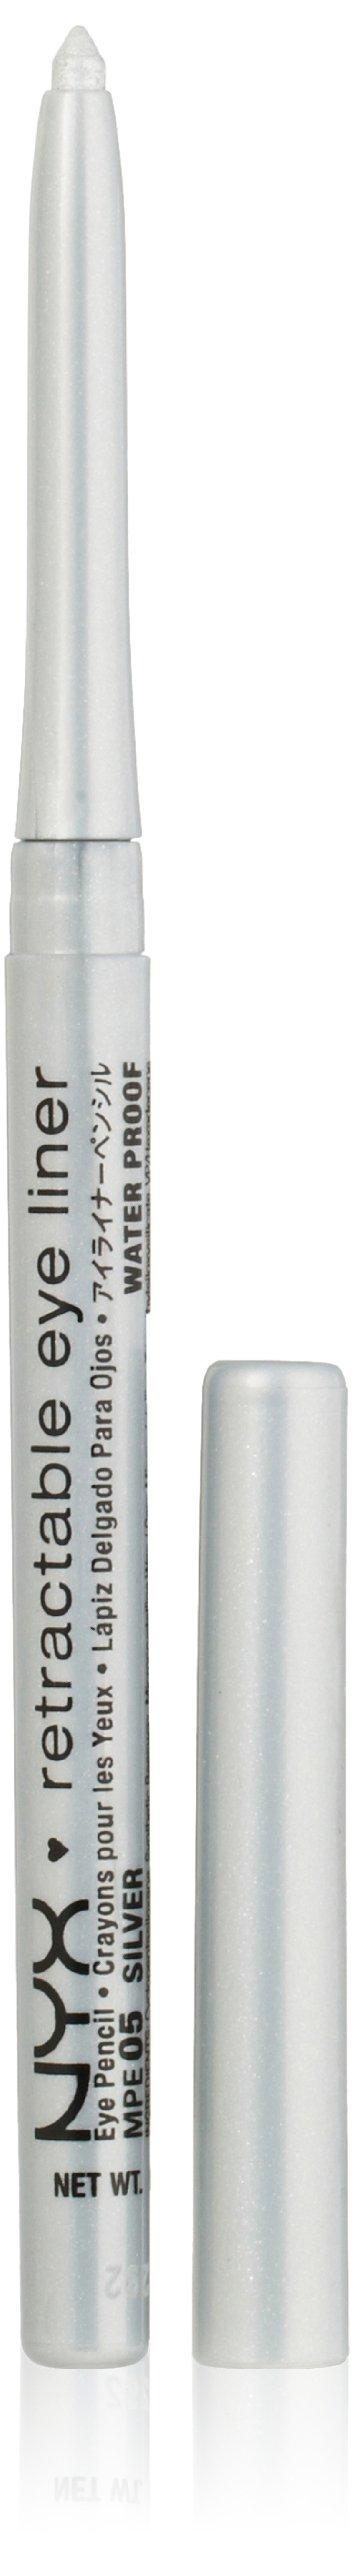 NYX Mechanical Eye Pencil, Silver